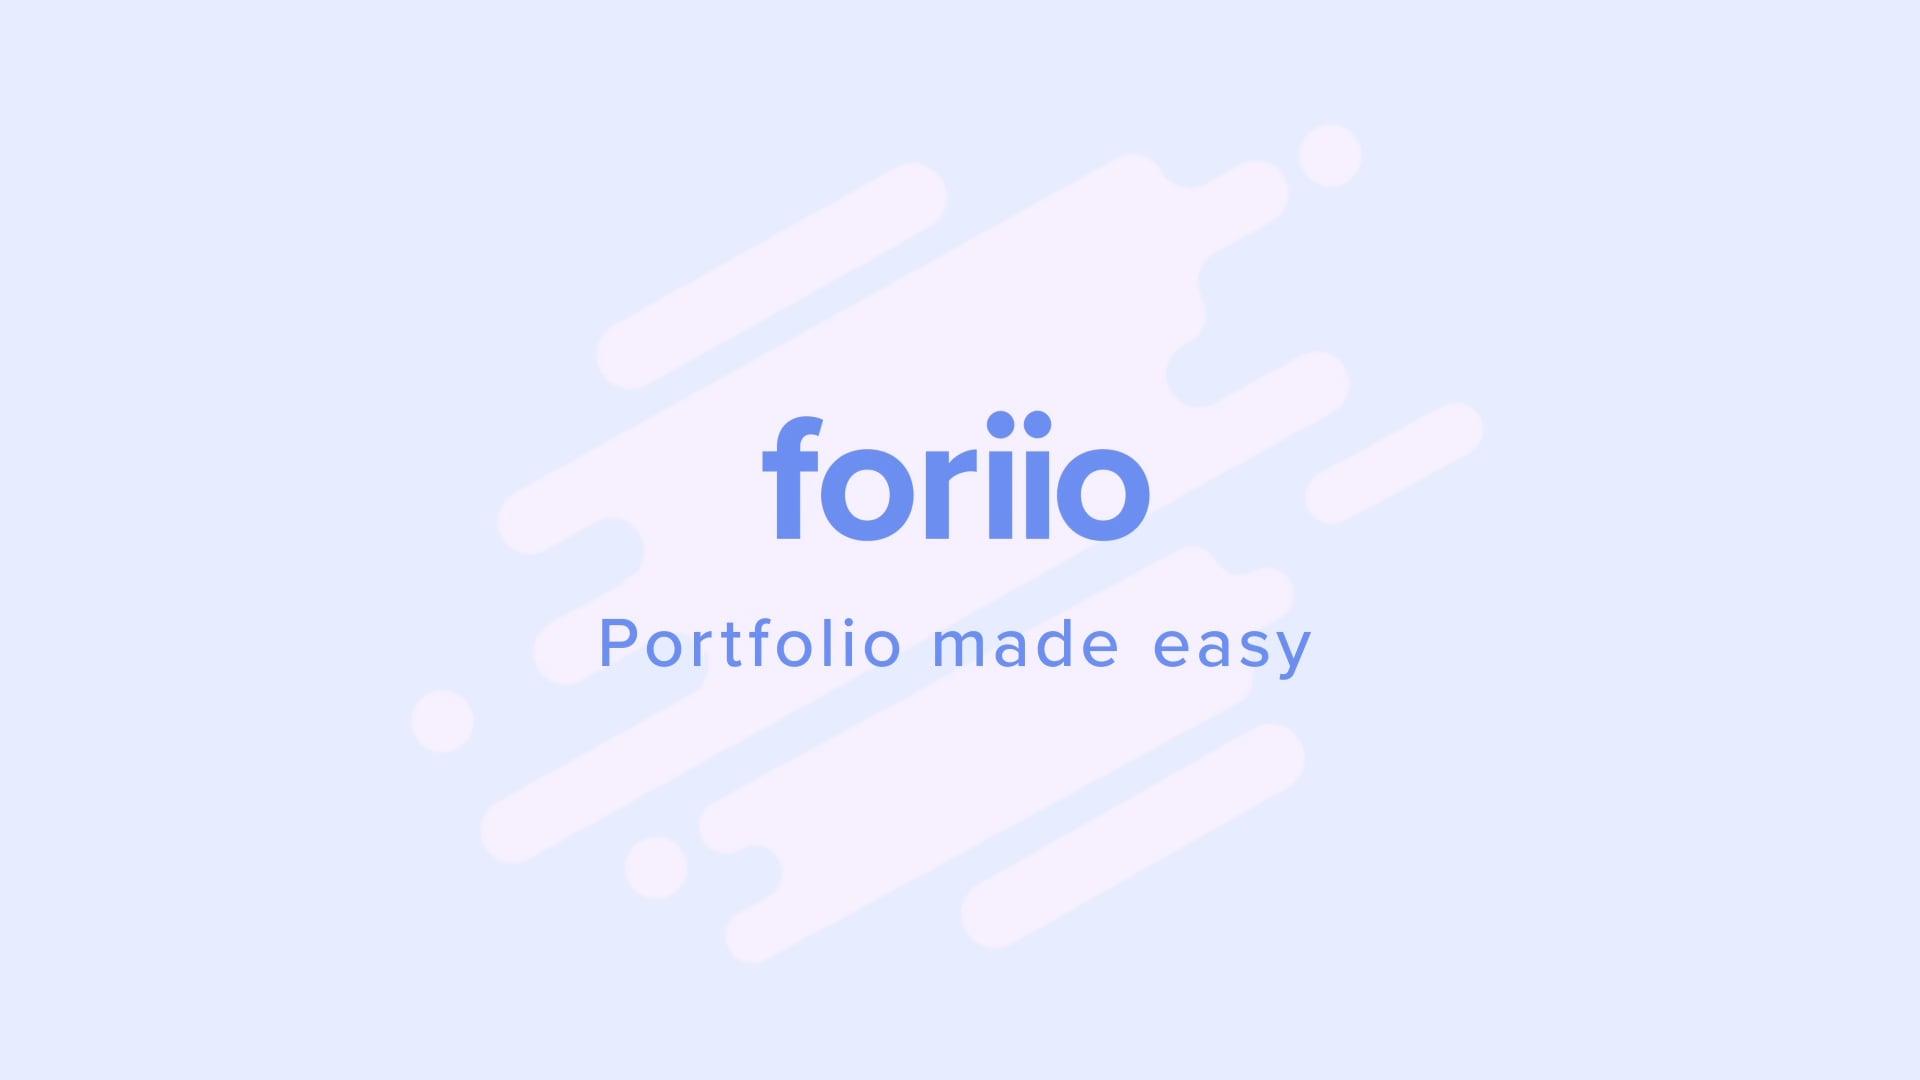 foriio - Intro video